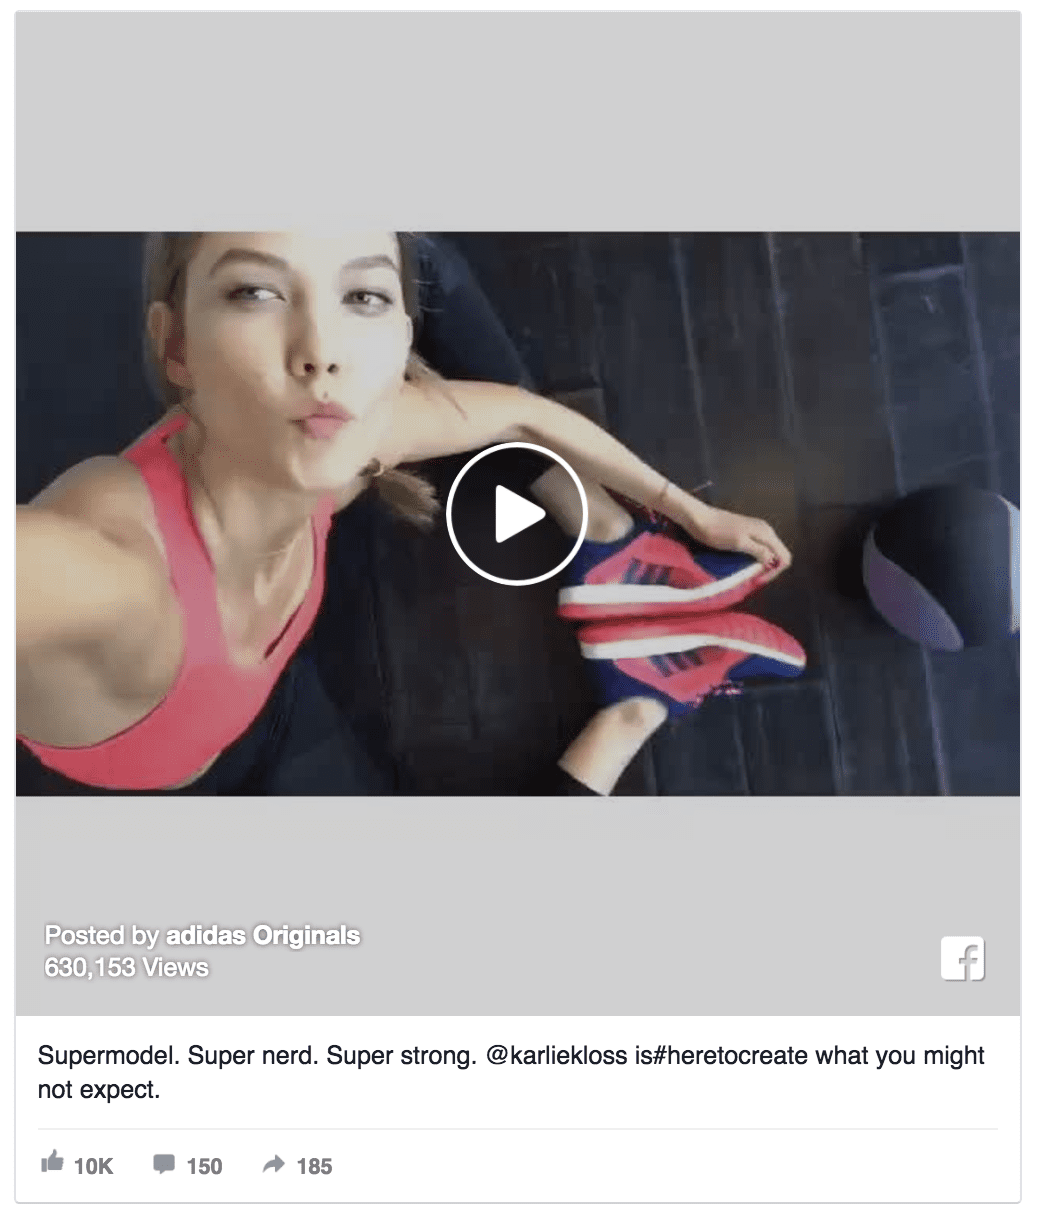 adidas facebook video